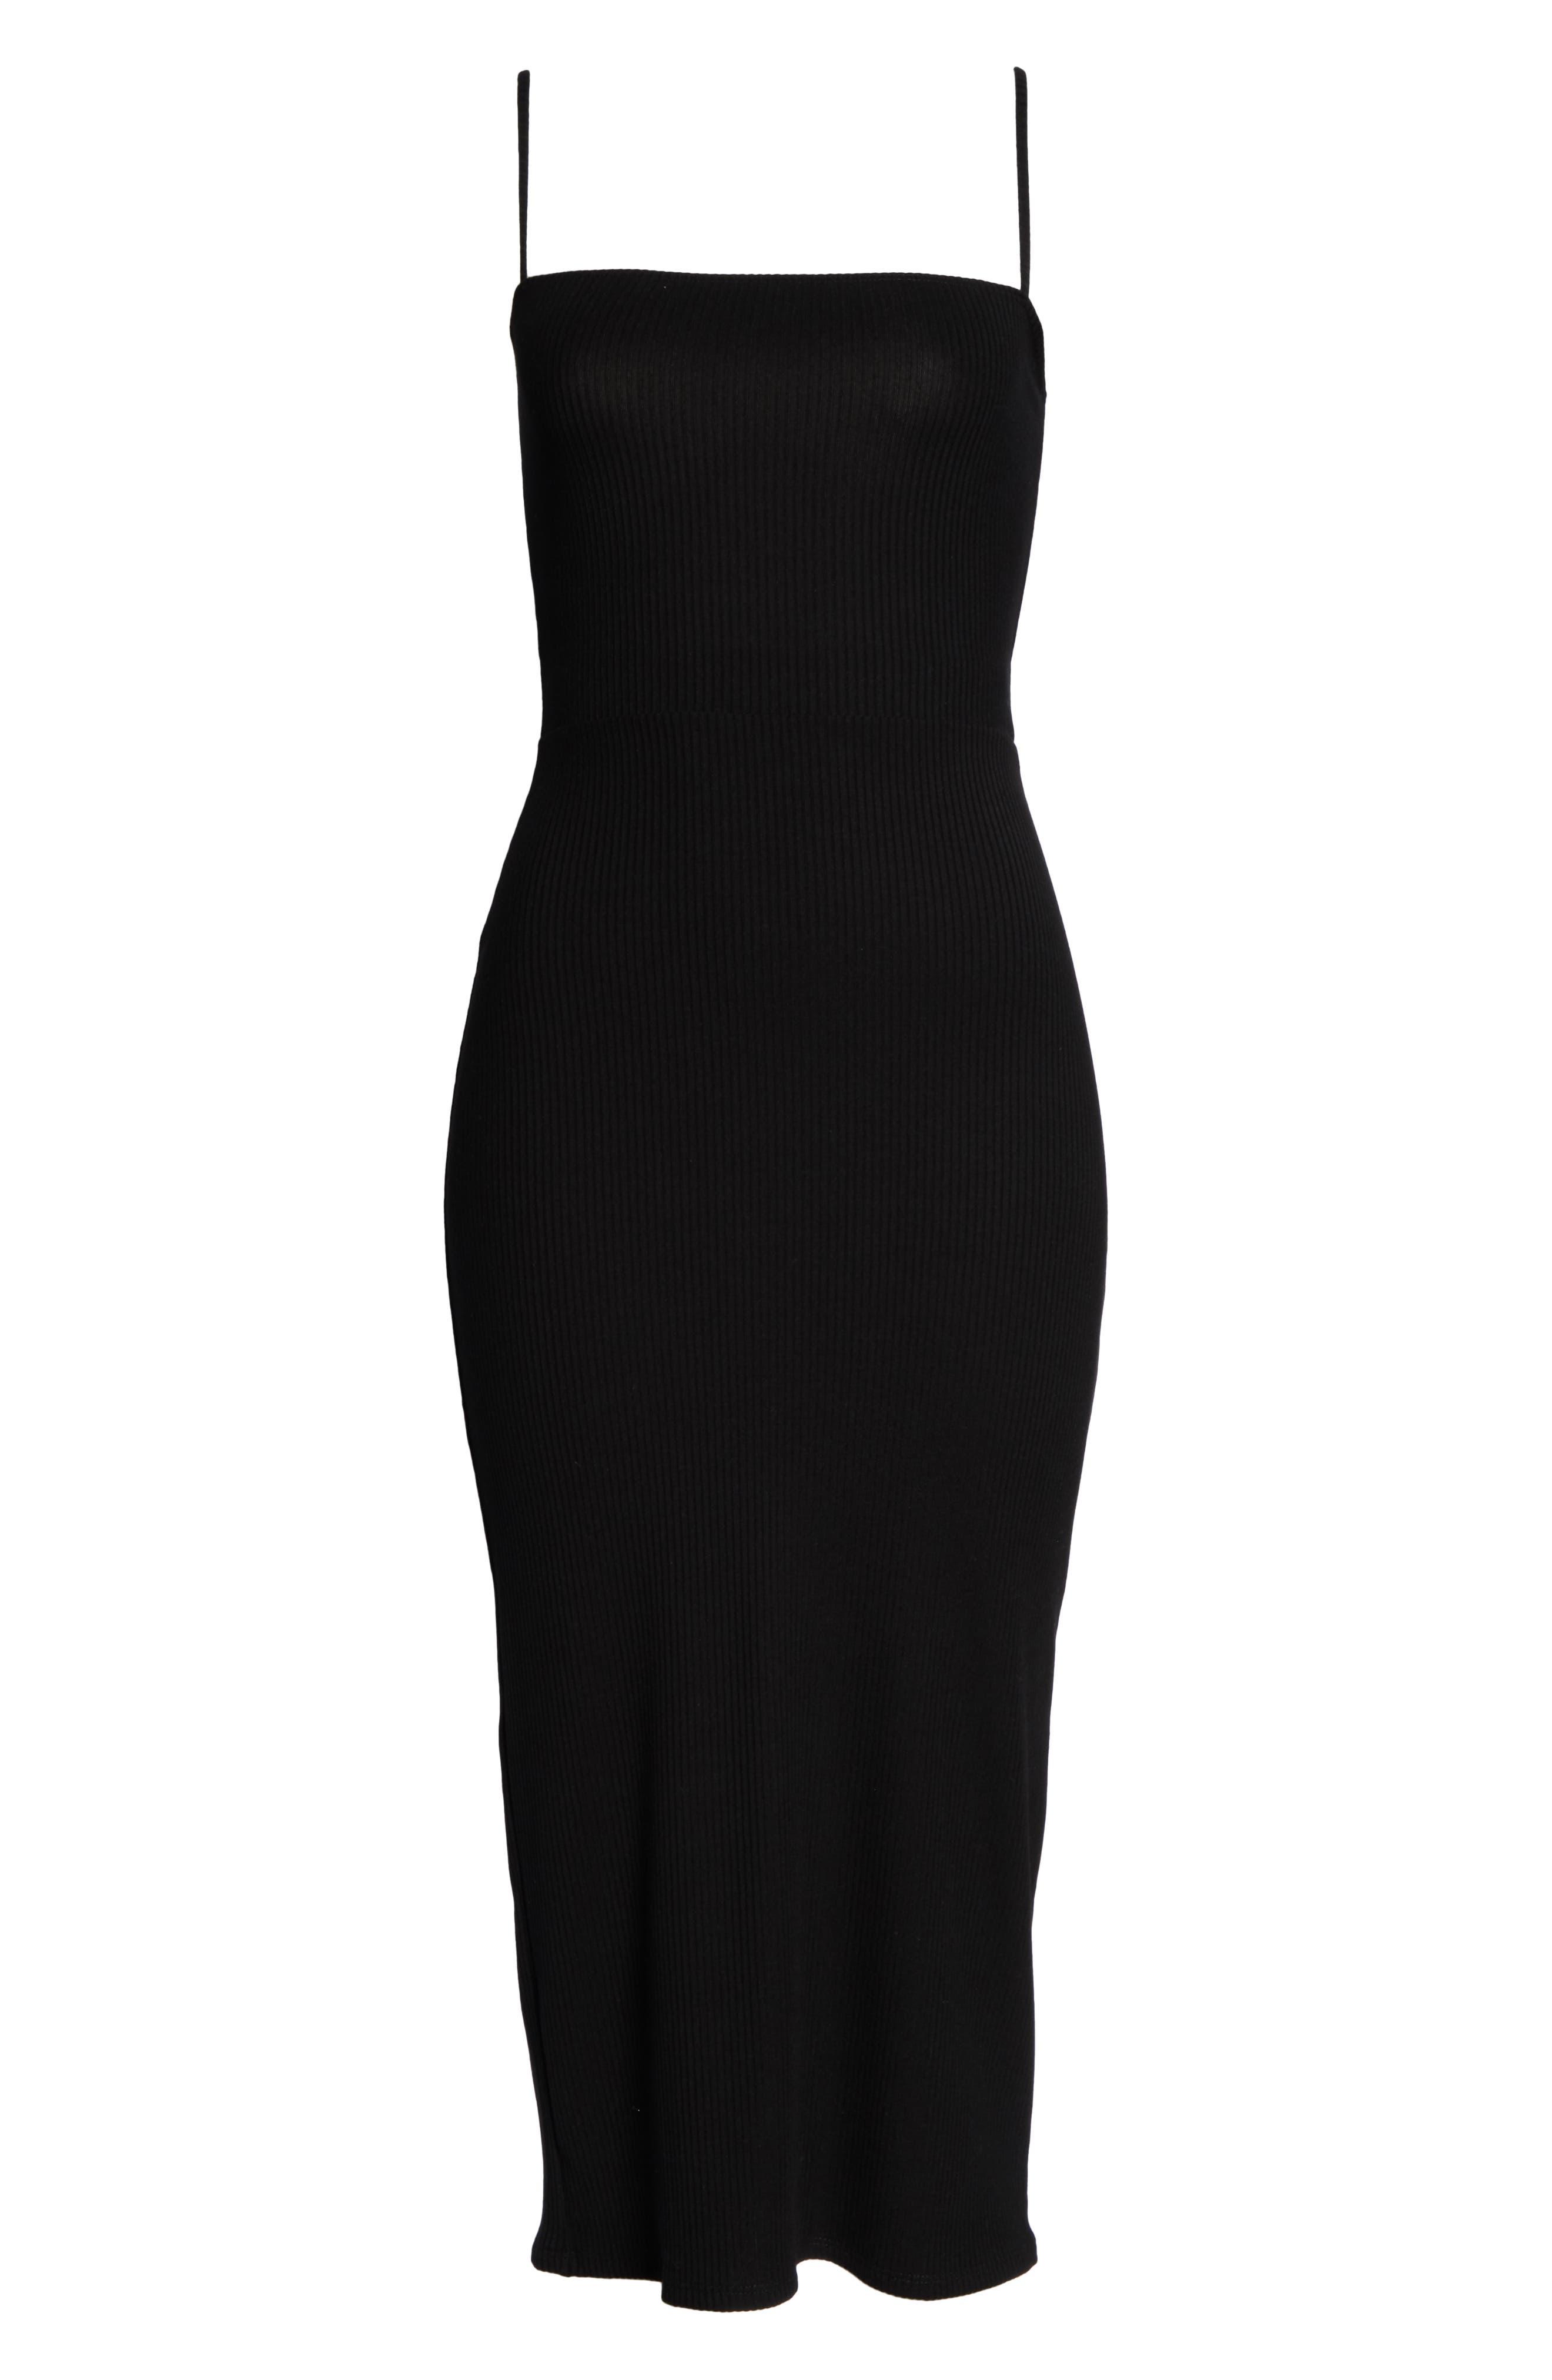 REFORMATION, Haley Midi Dress, Alternate thumbnail 5, color, BLACK